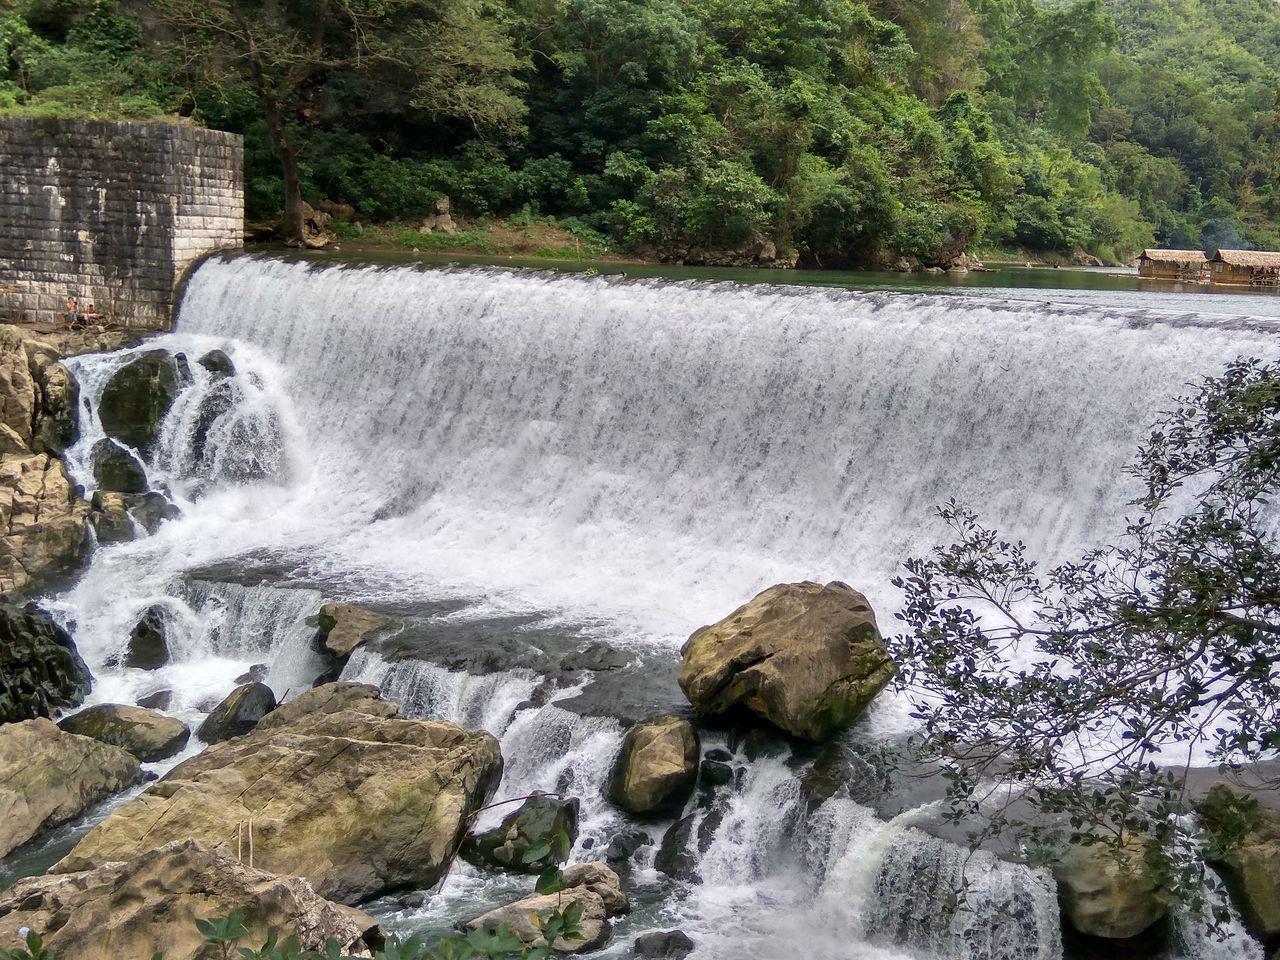 Wawa Dam 💙 Mt. Pamintinan Rizal Tree Water Dam Wawa Dam Rodriguez, Rizal Philippines Beauty In Nature Outdoors Waterfall Nature